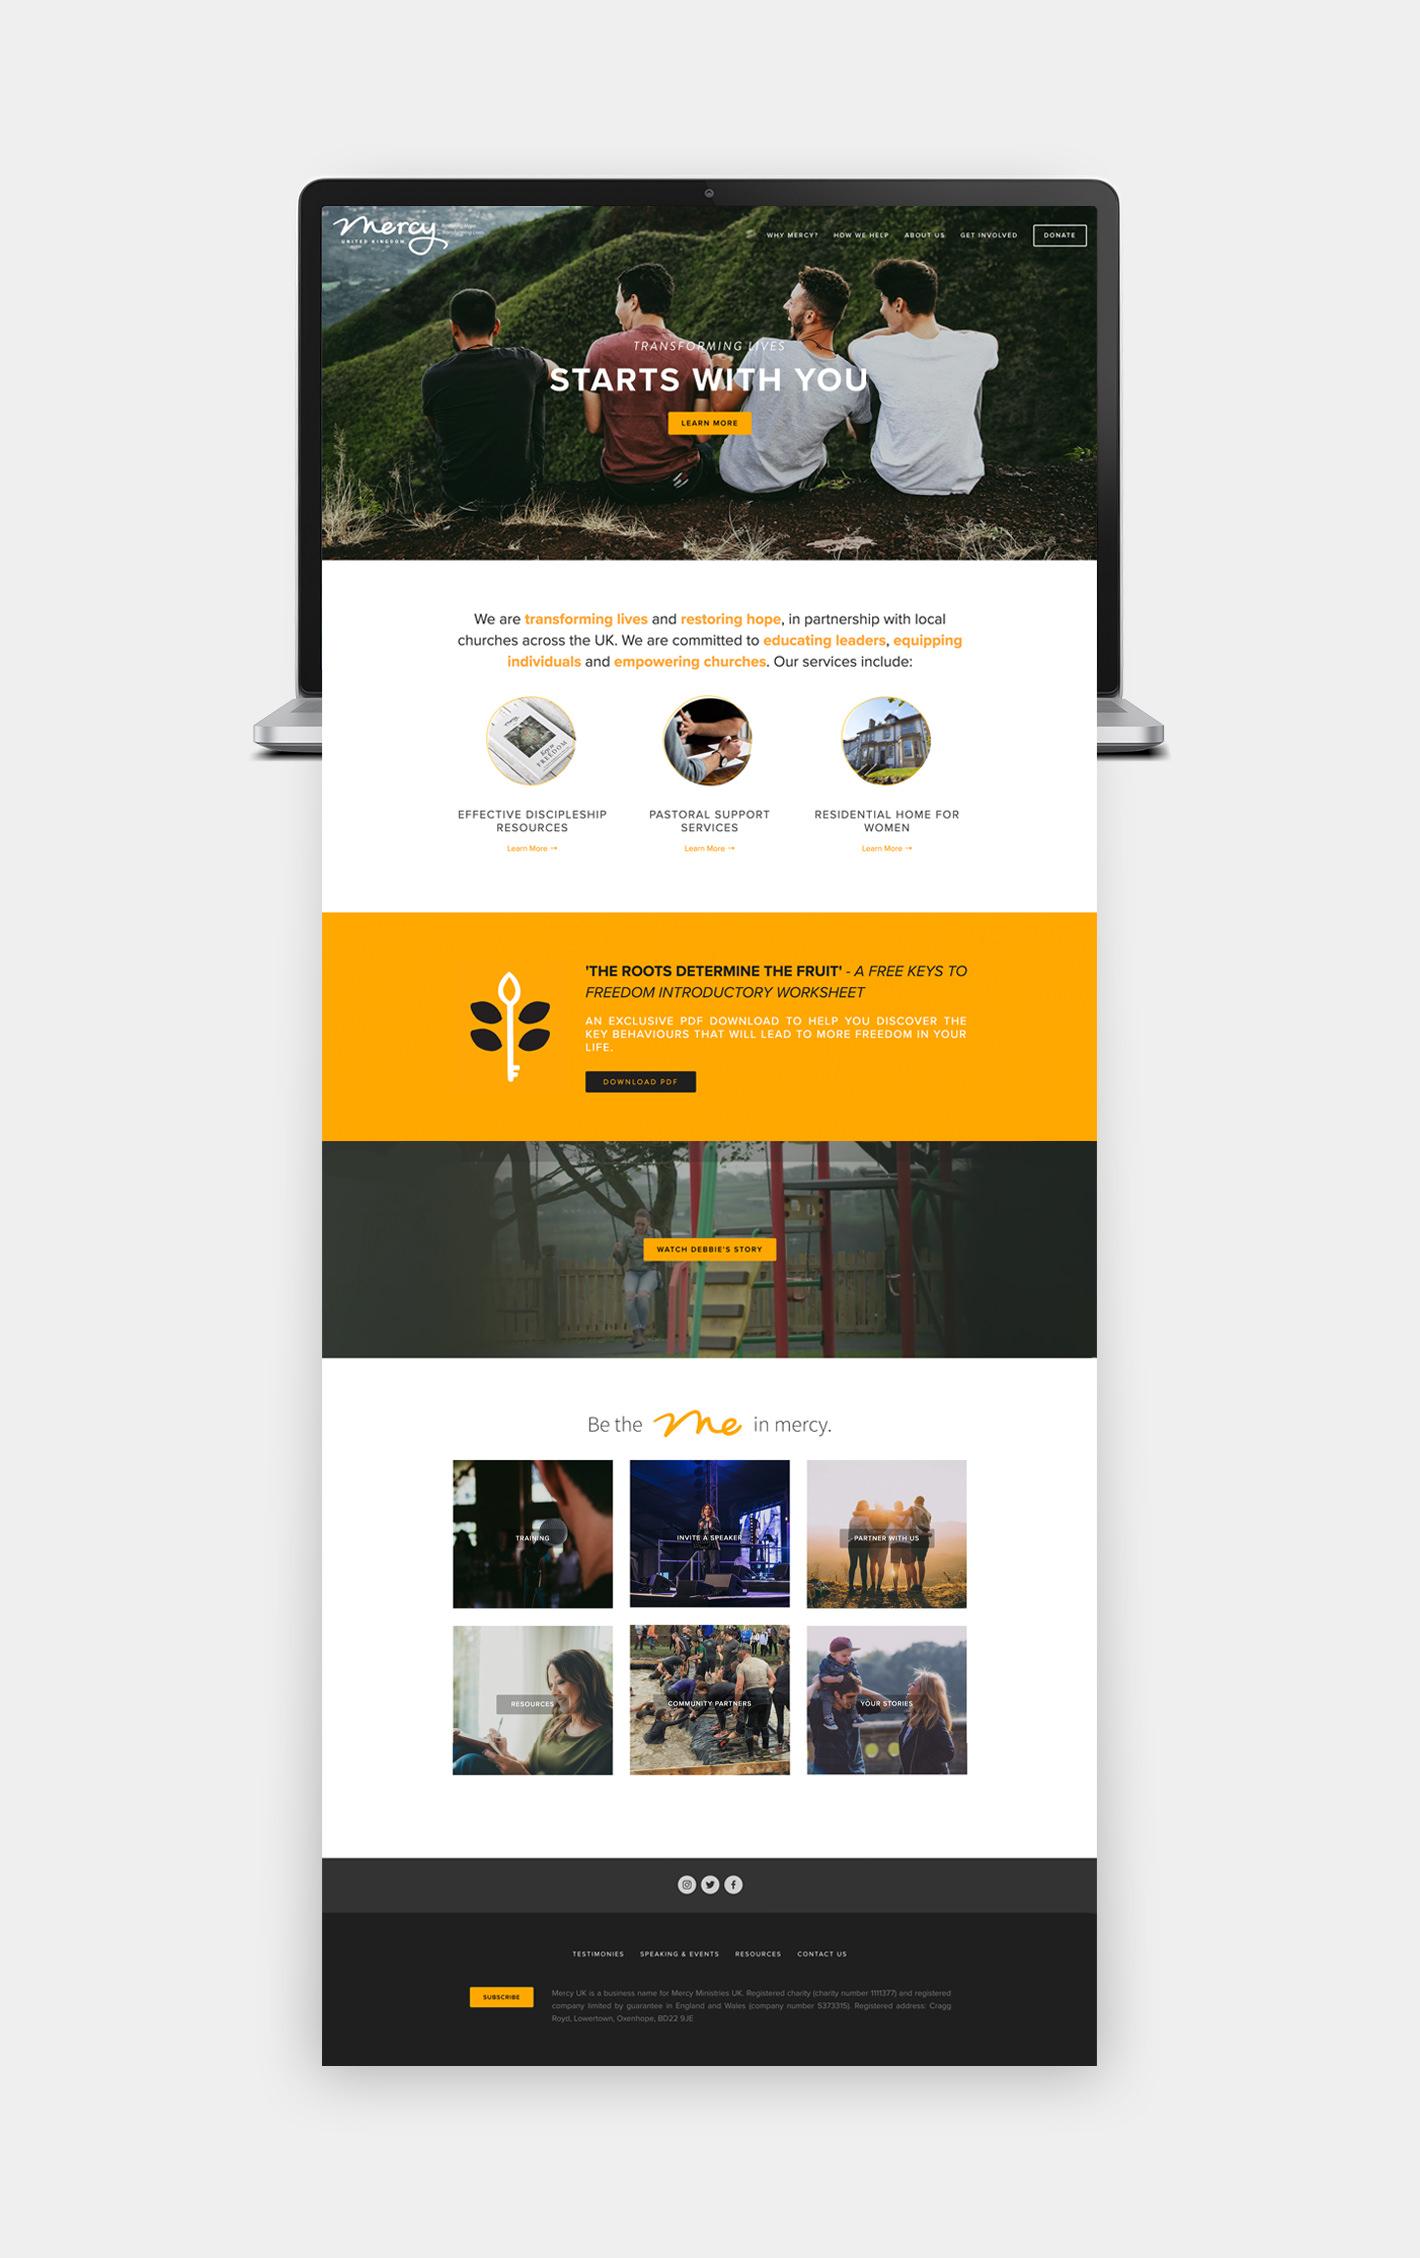 Mercy-Web-Design-Big-Blond-Bear-Branding-5.jpg